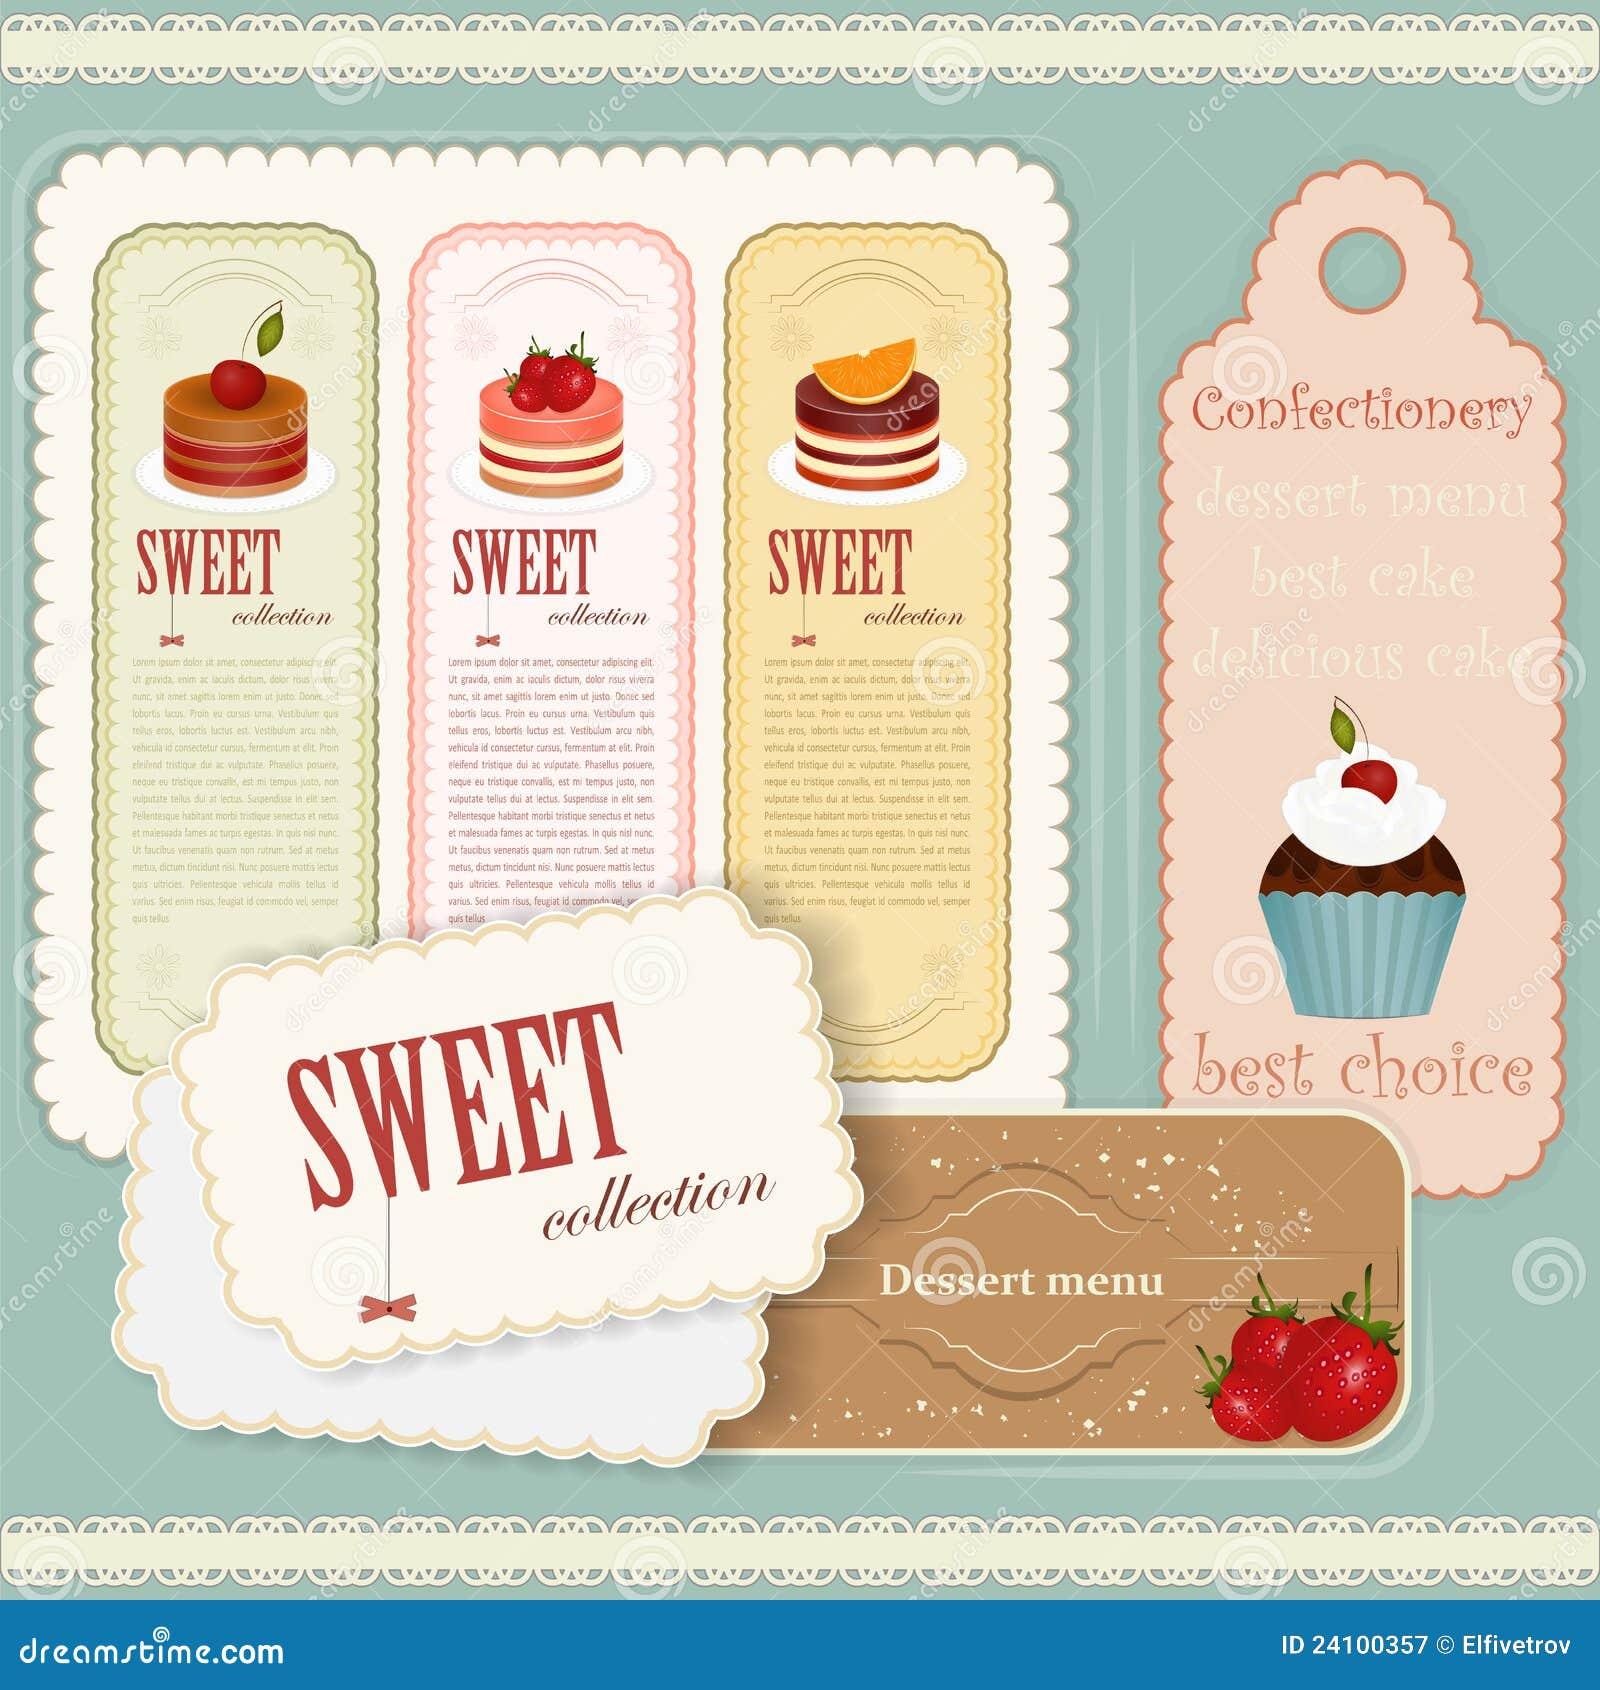 vintage dessert menu